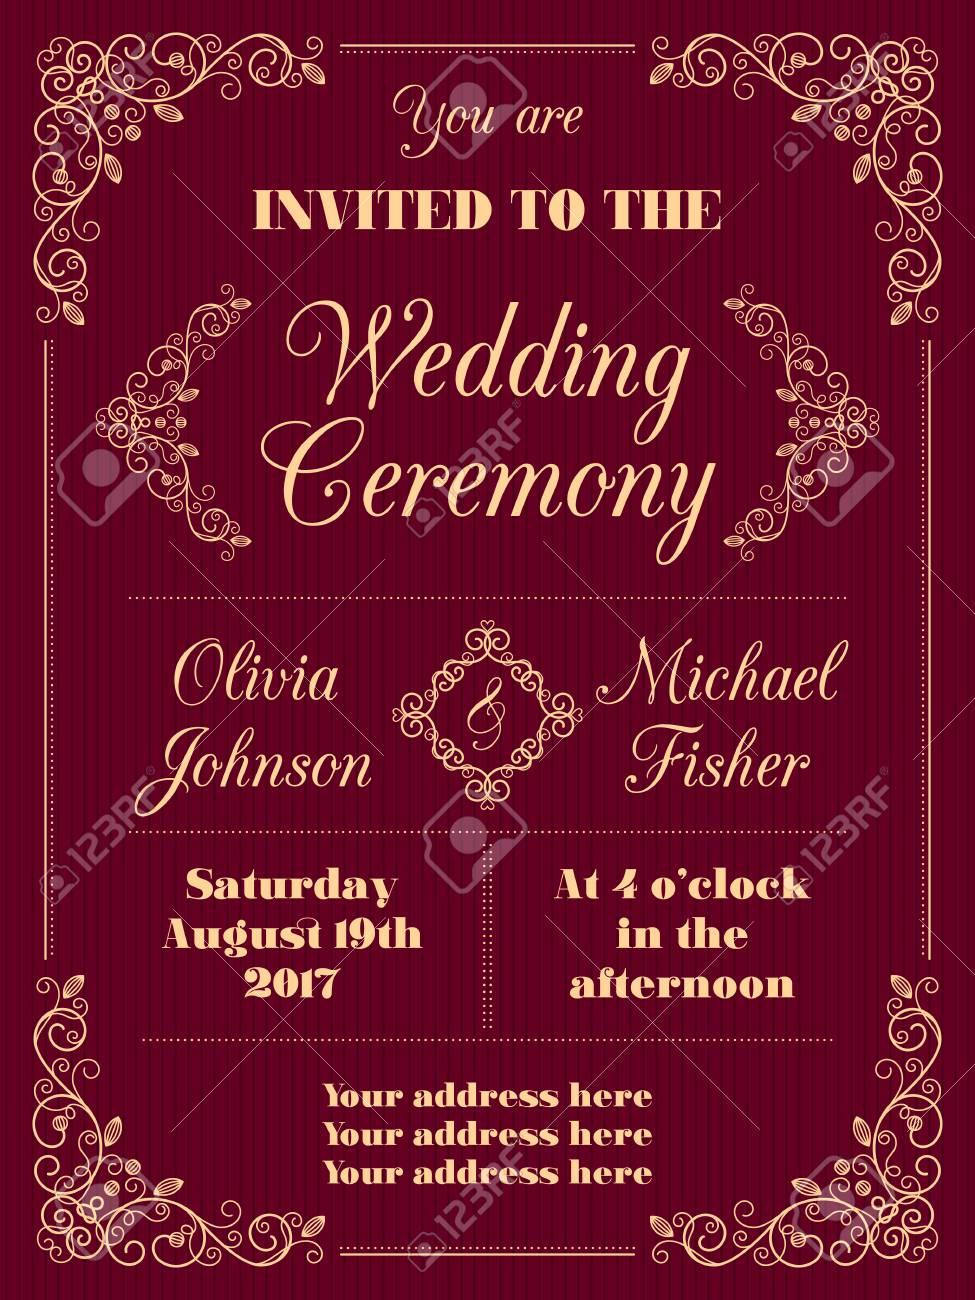 Wedding Invitation In Retro Style With Decorative Design Elements ...